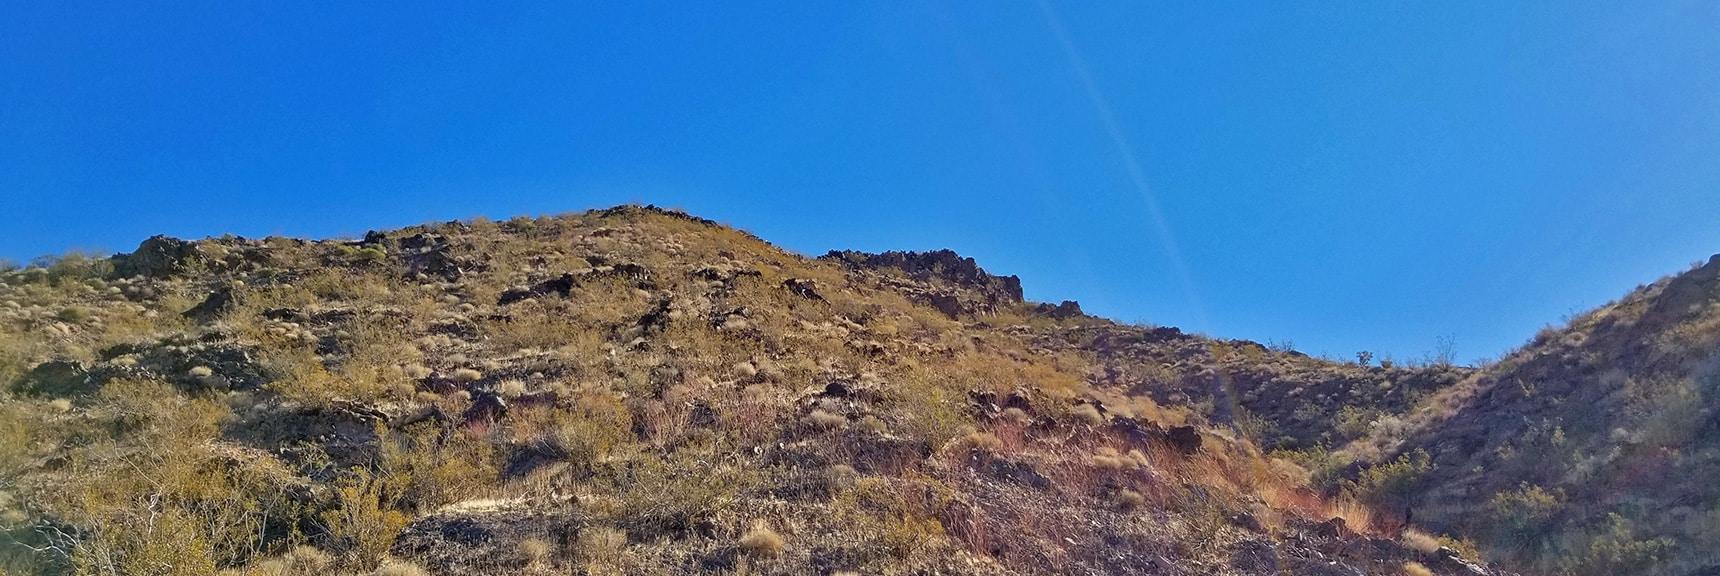 Ascending an Avalanche Slope Toward Hamblin Mt. | Hamblin Mountain, Lake Mead National Conservation Area, Nevada